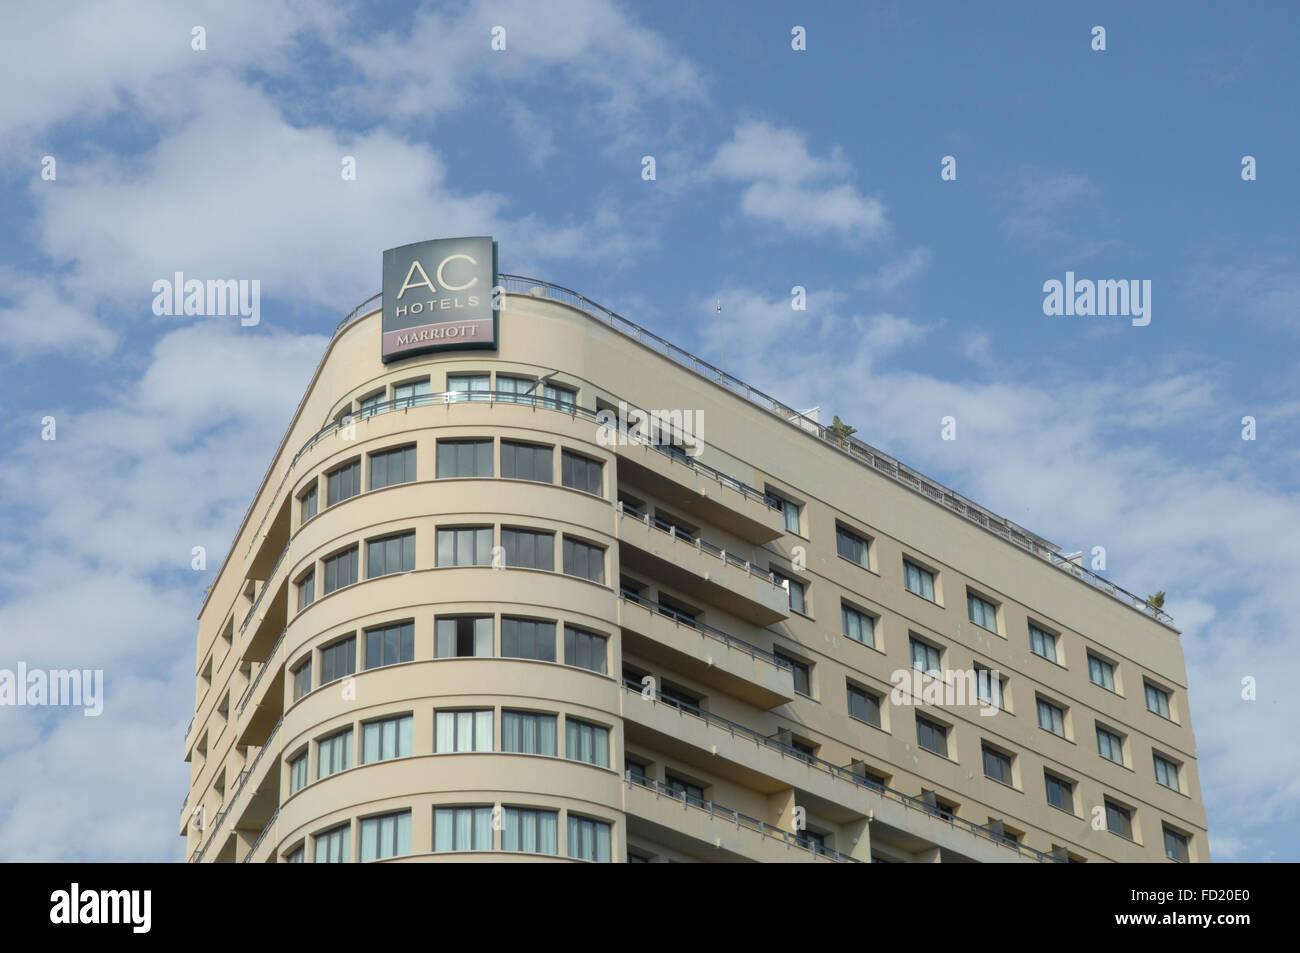 Ac Hotel Malaga Palacio Marriott 5 Sterne In Malaga Zentralspanien